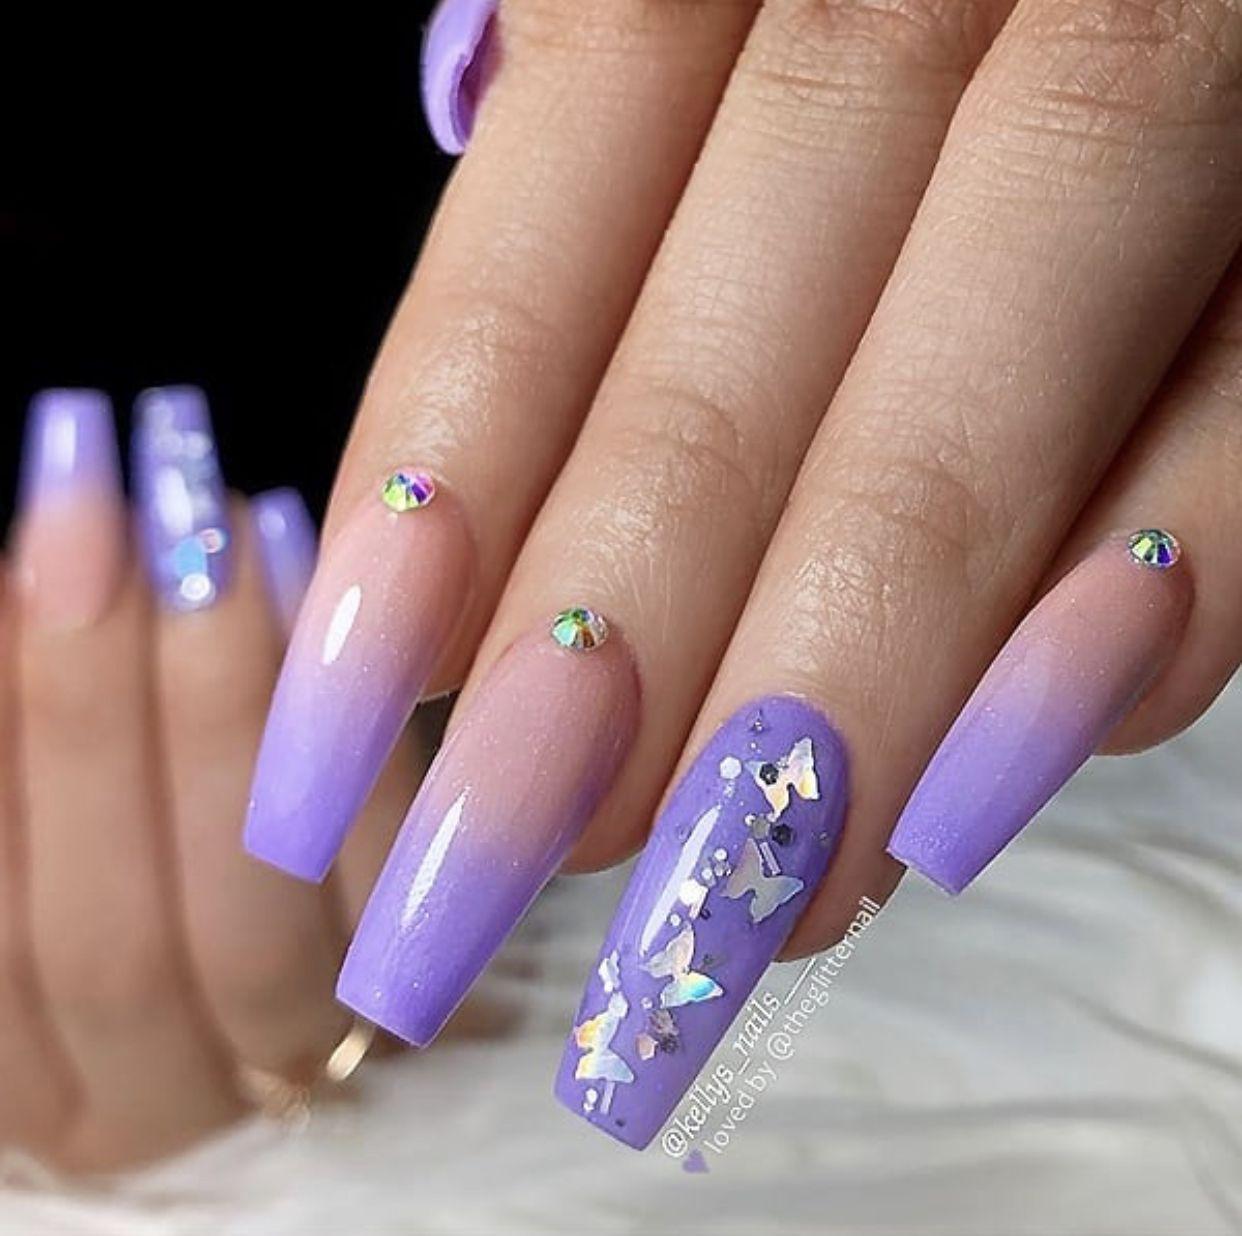 Trending Bridal Nail Art Design Ideas Best Bridal Nail Art Inspiration Easy Nail Art Ideas In 2020 Purple Acrylic Nails Purple Ombre Nails Ombre Acrylic Nails